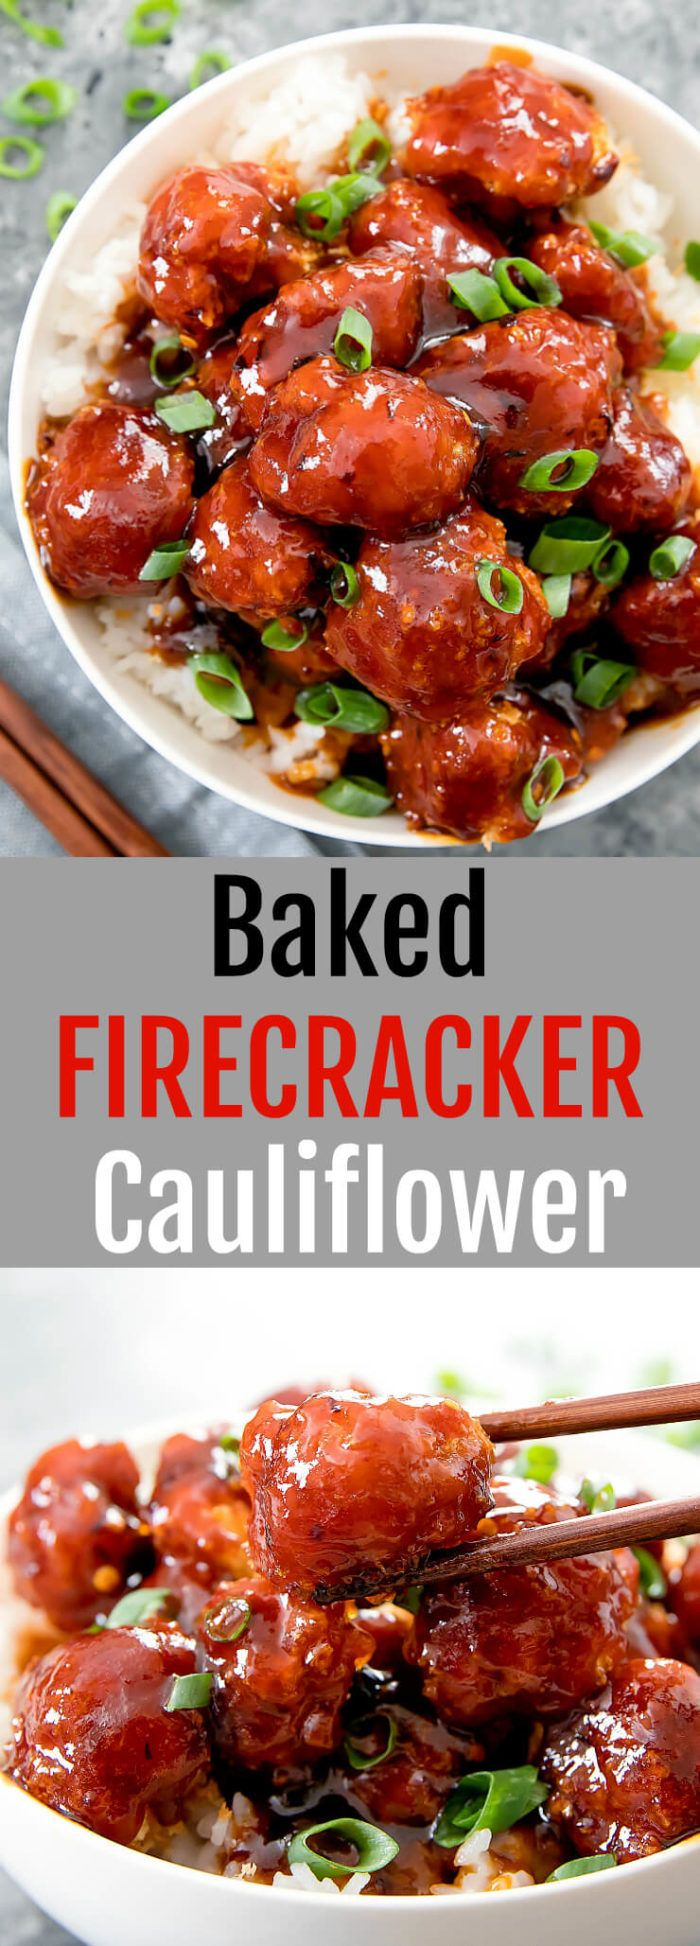 Firecracker Cauliflower